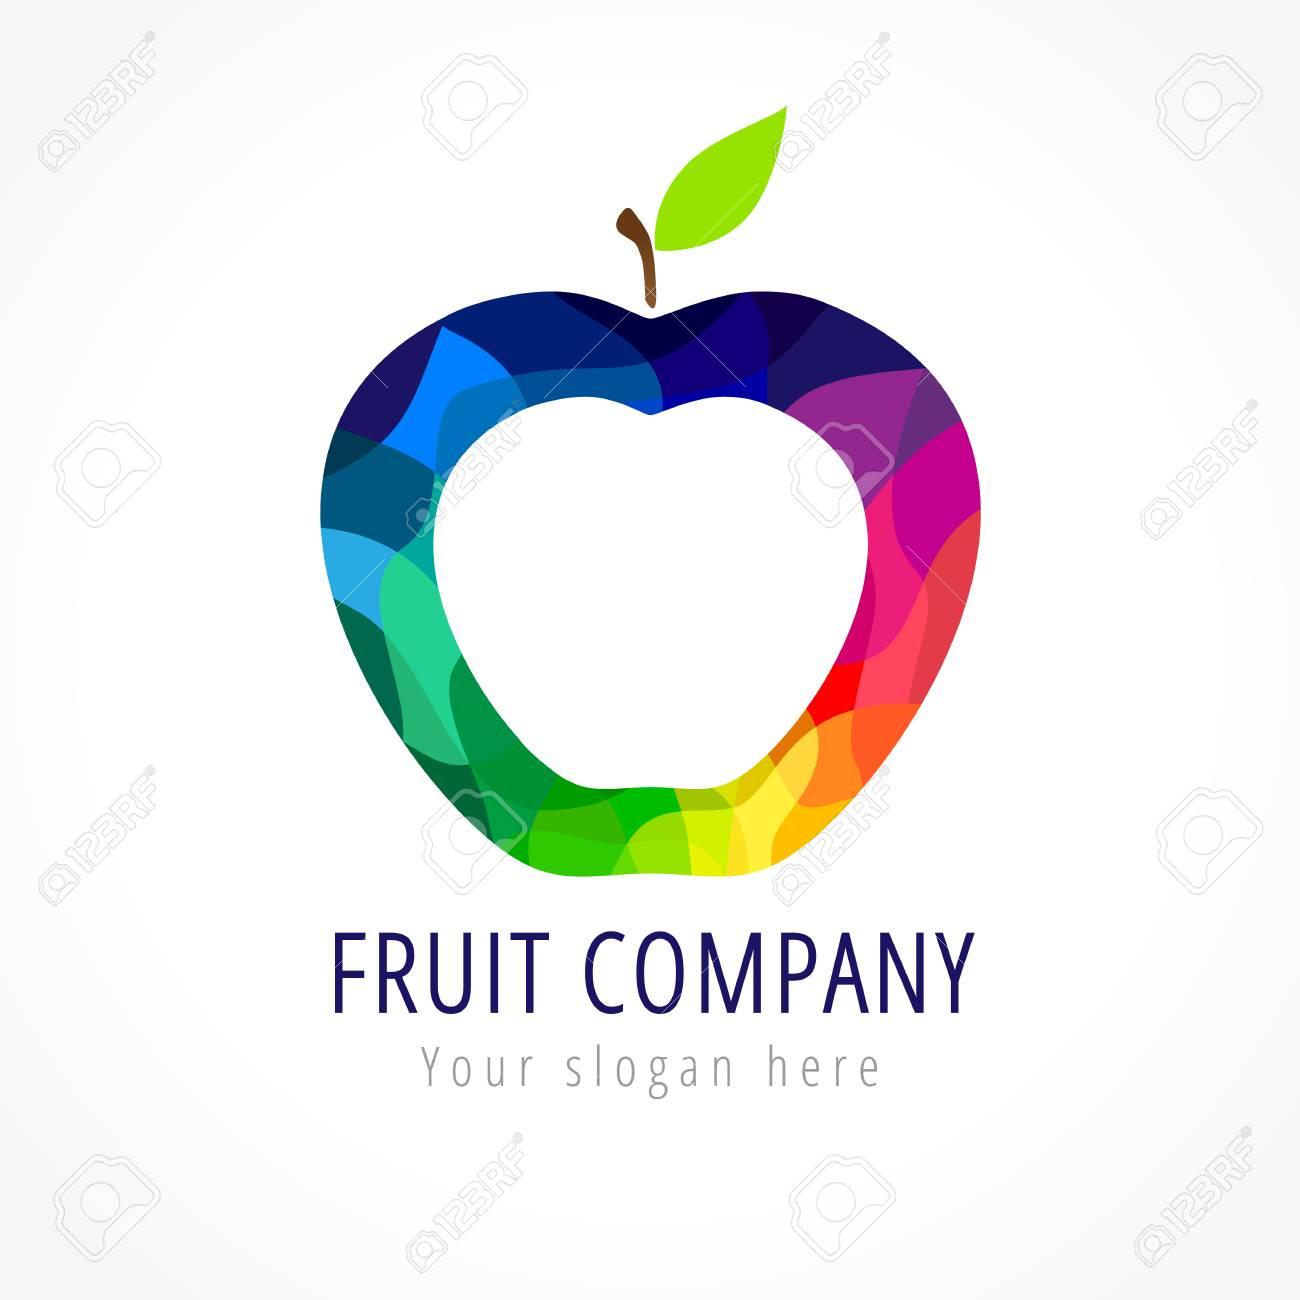 Fruit Unternehmen Vektor-Logo. Buntglasstücke Farbiger Apfel ...